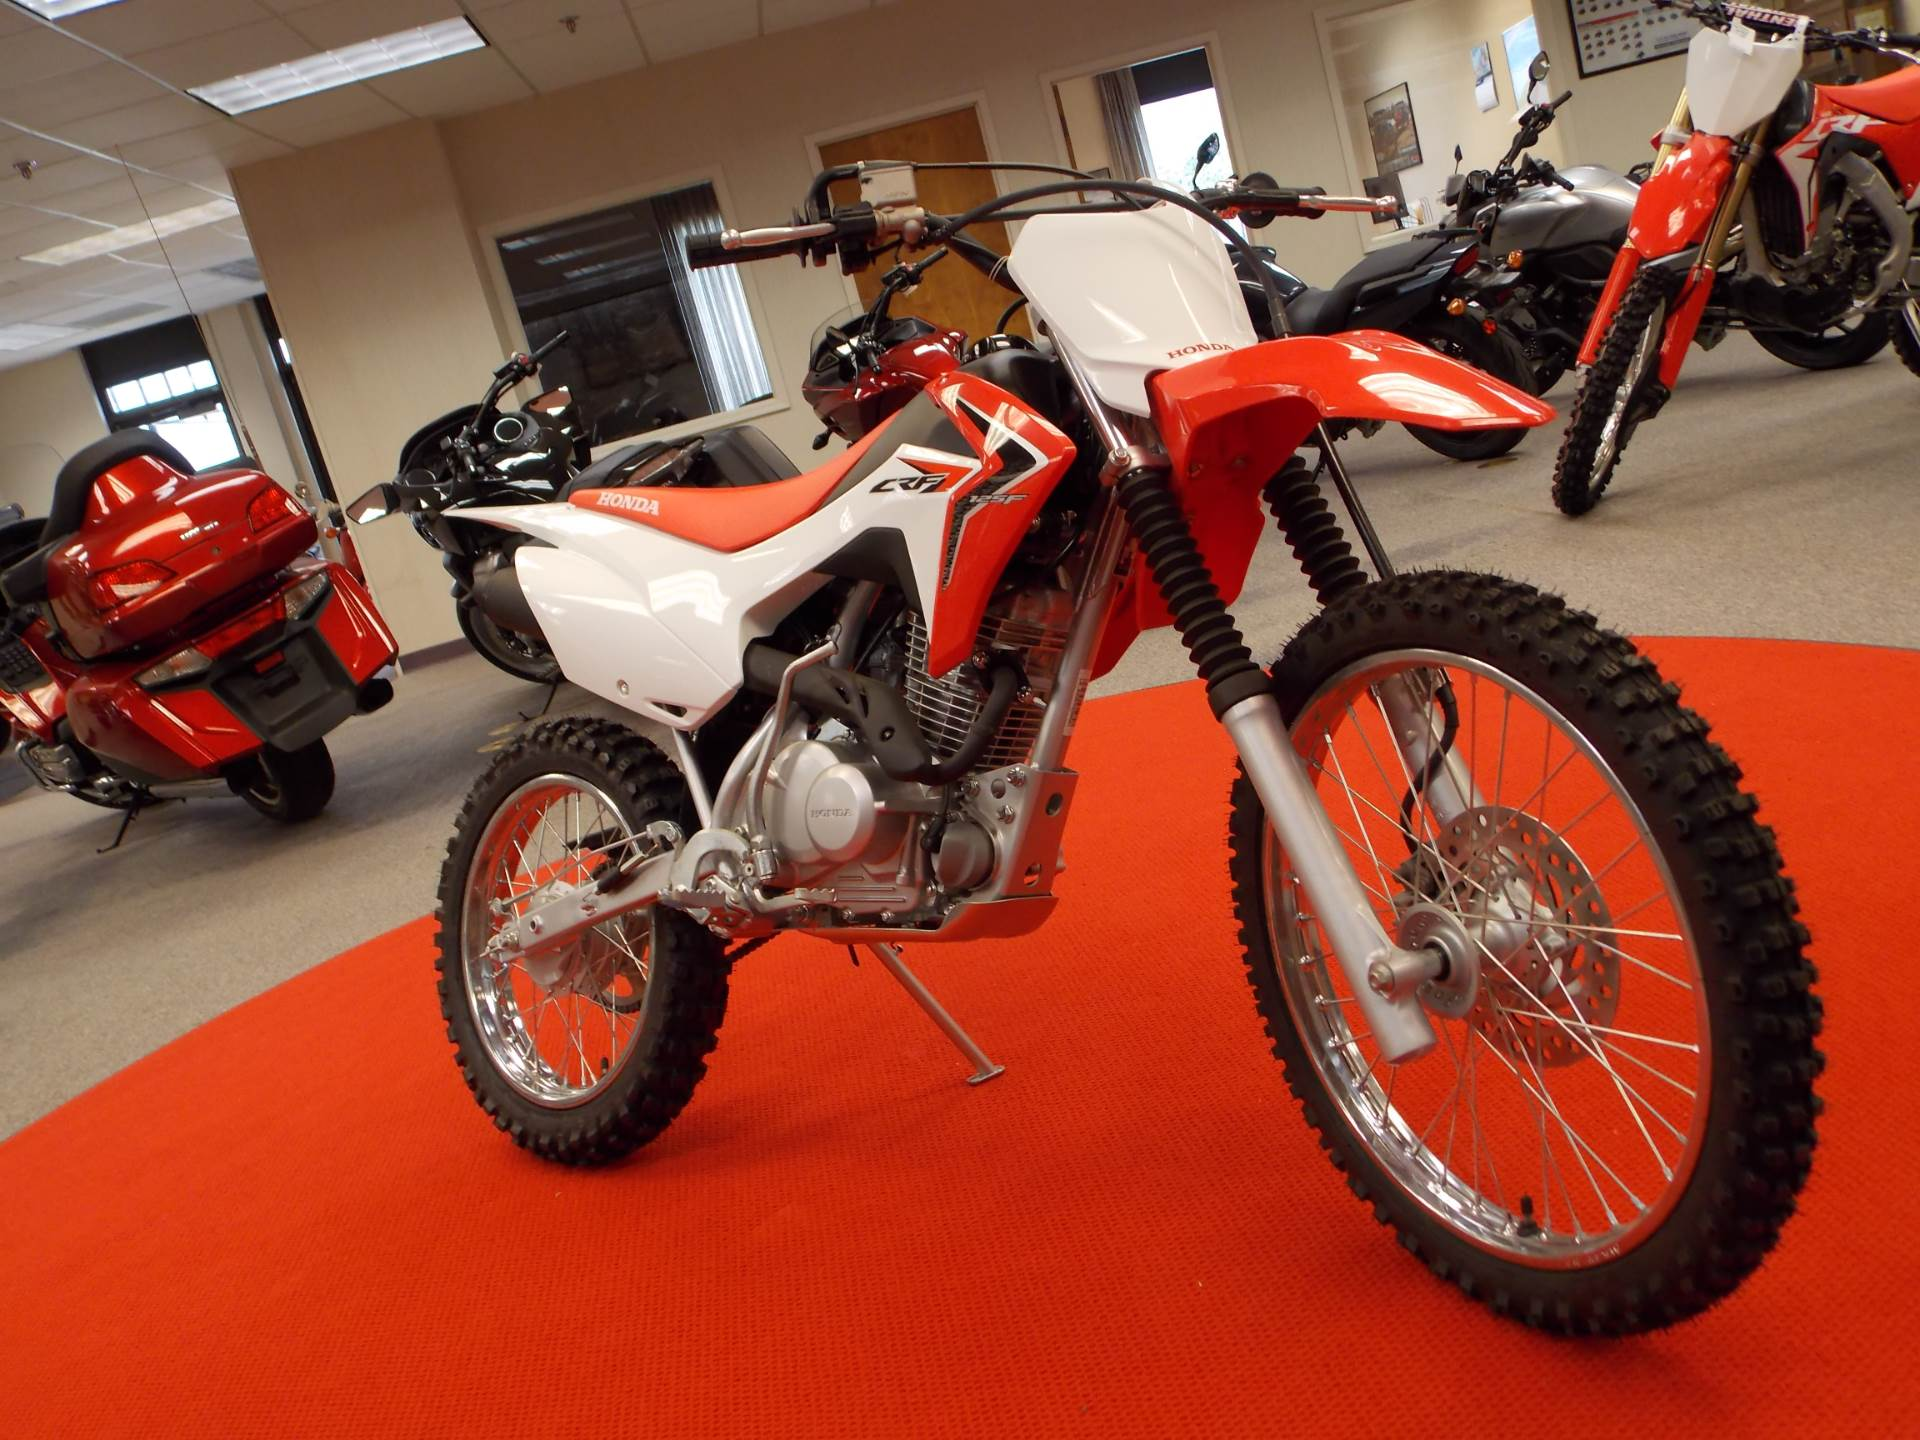 new 2017 honda crf125f (big wheel) motorcycles in statesville, nc